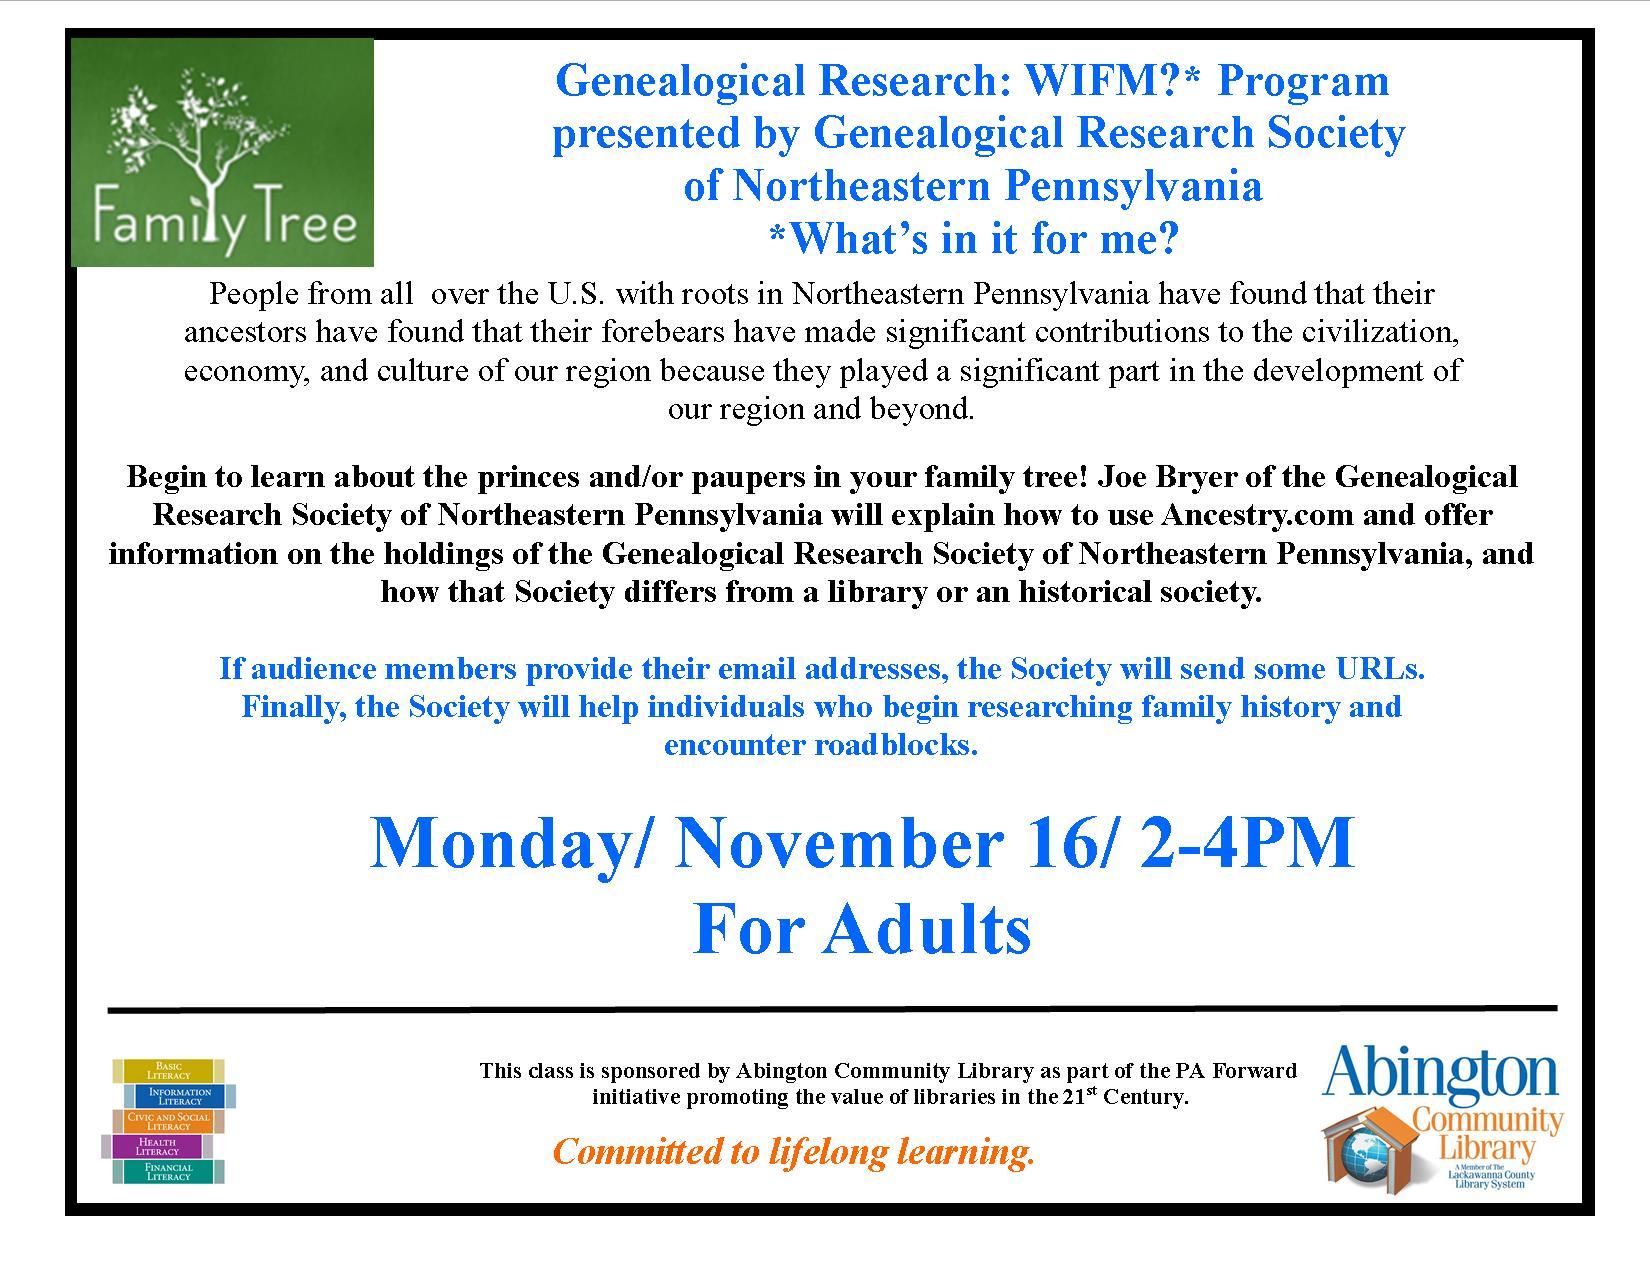 Genealogy Class_NEPA GenealogySociety_Nov 16